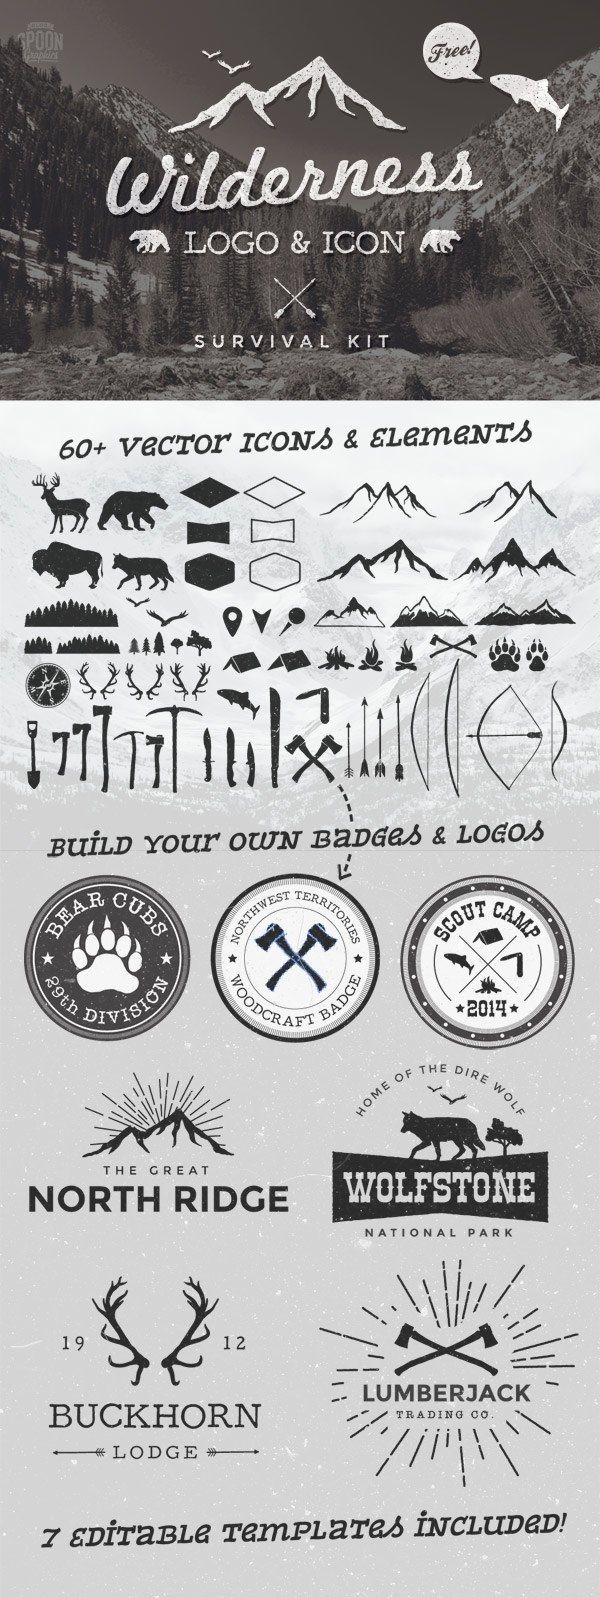 Free Wilderness Vector Graphics & Logo Template Kit